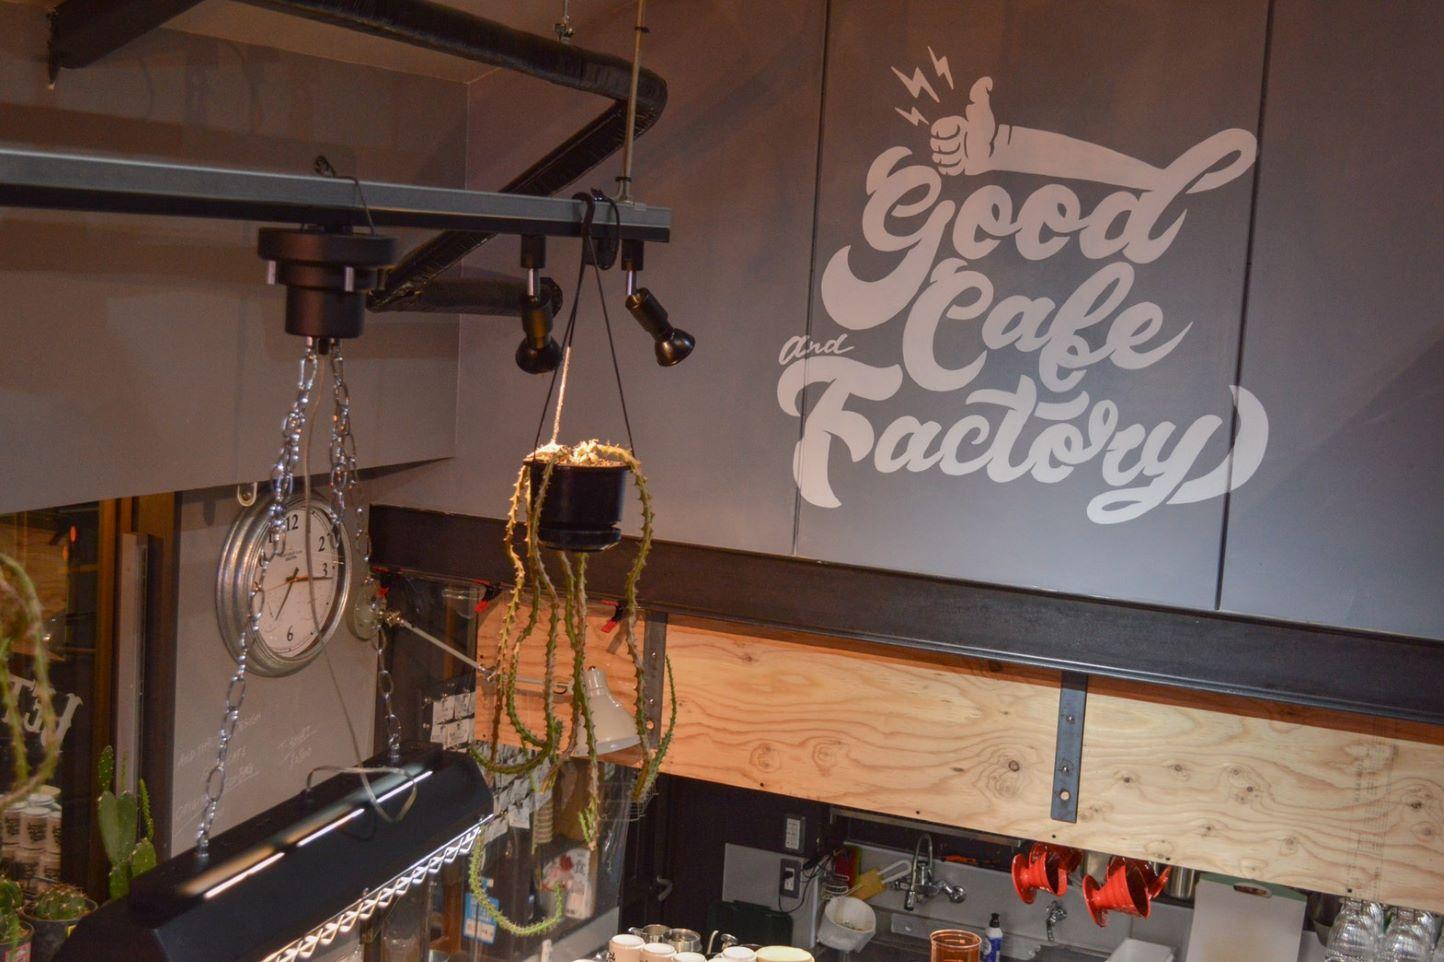 good cafe & factory スライダー画像1